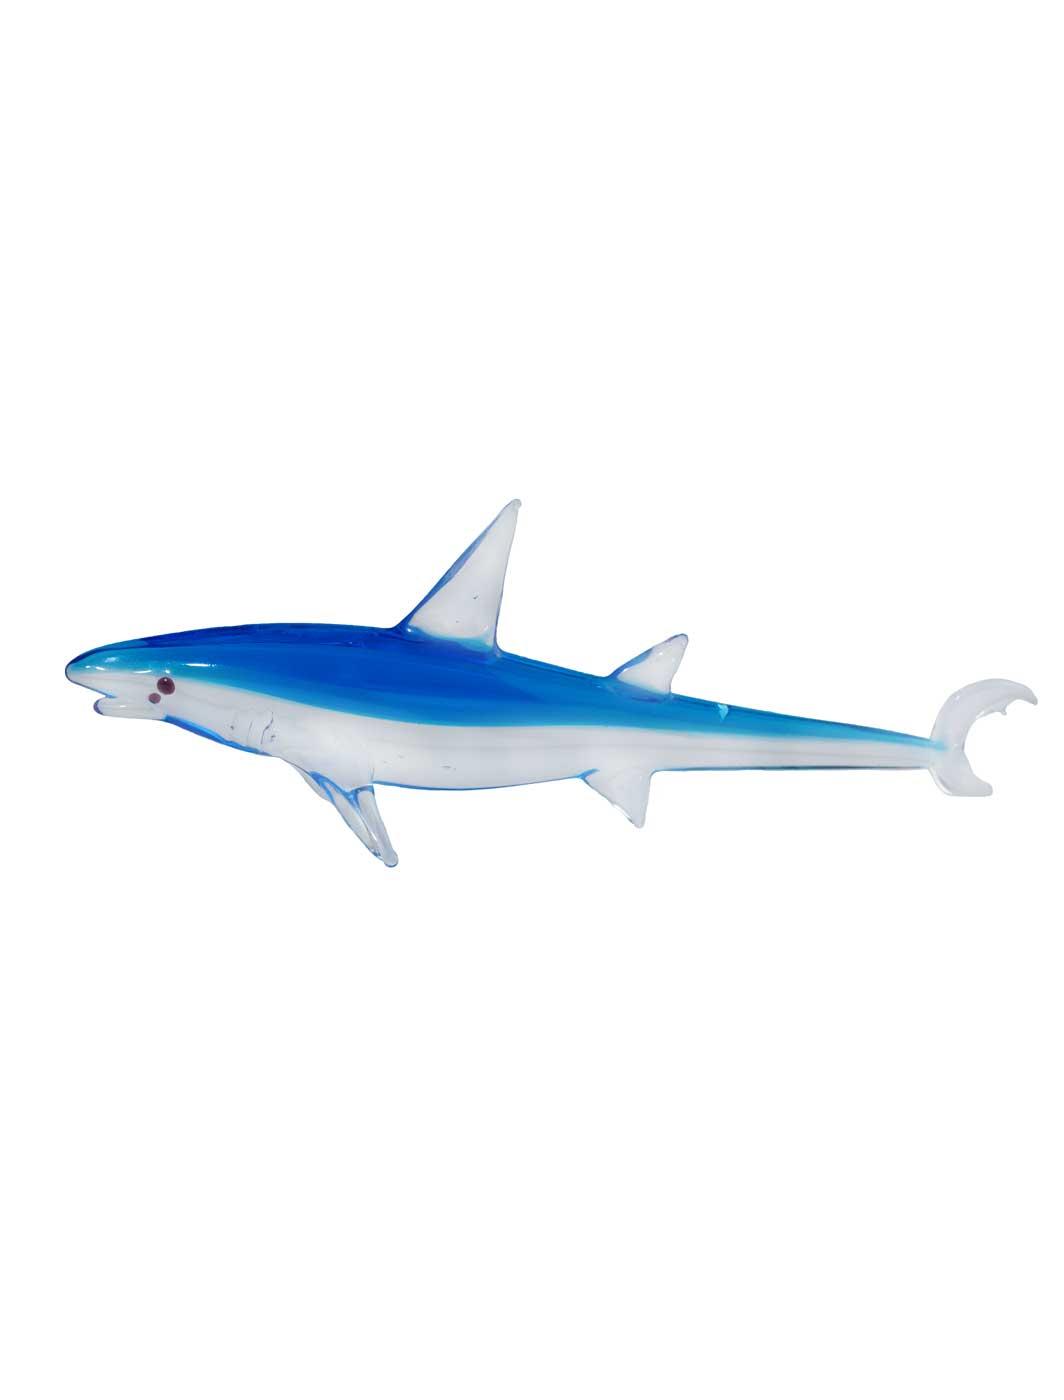 Glasfigur Hai kristall blau